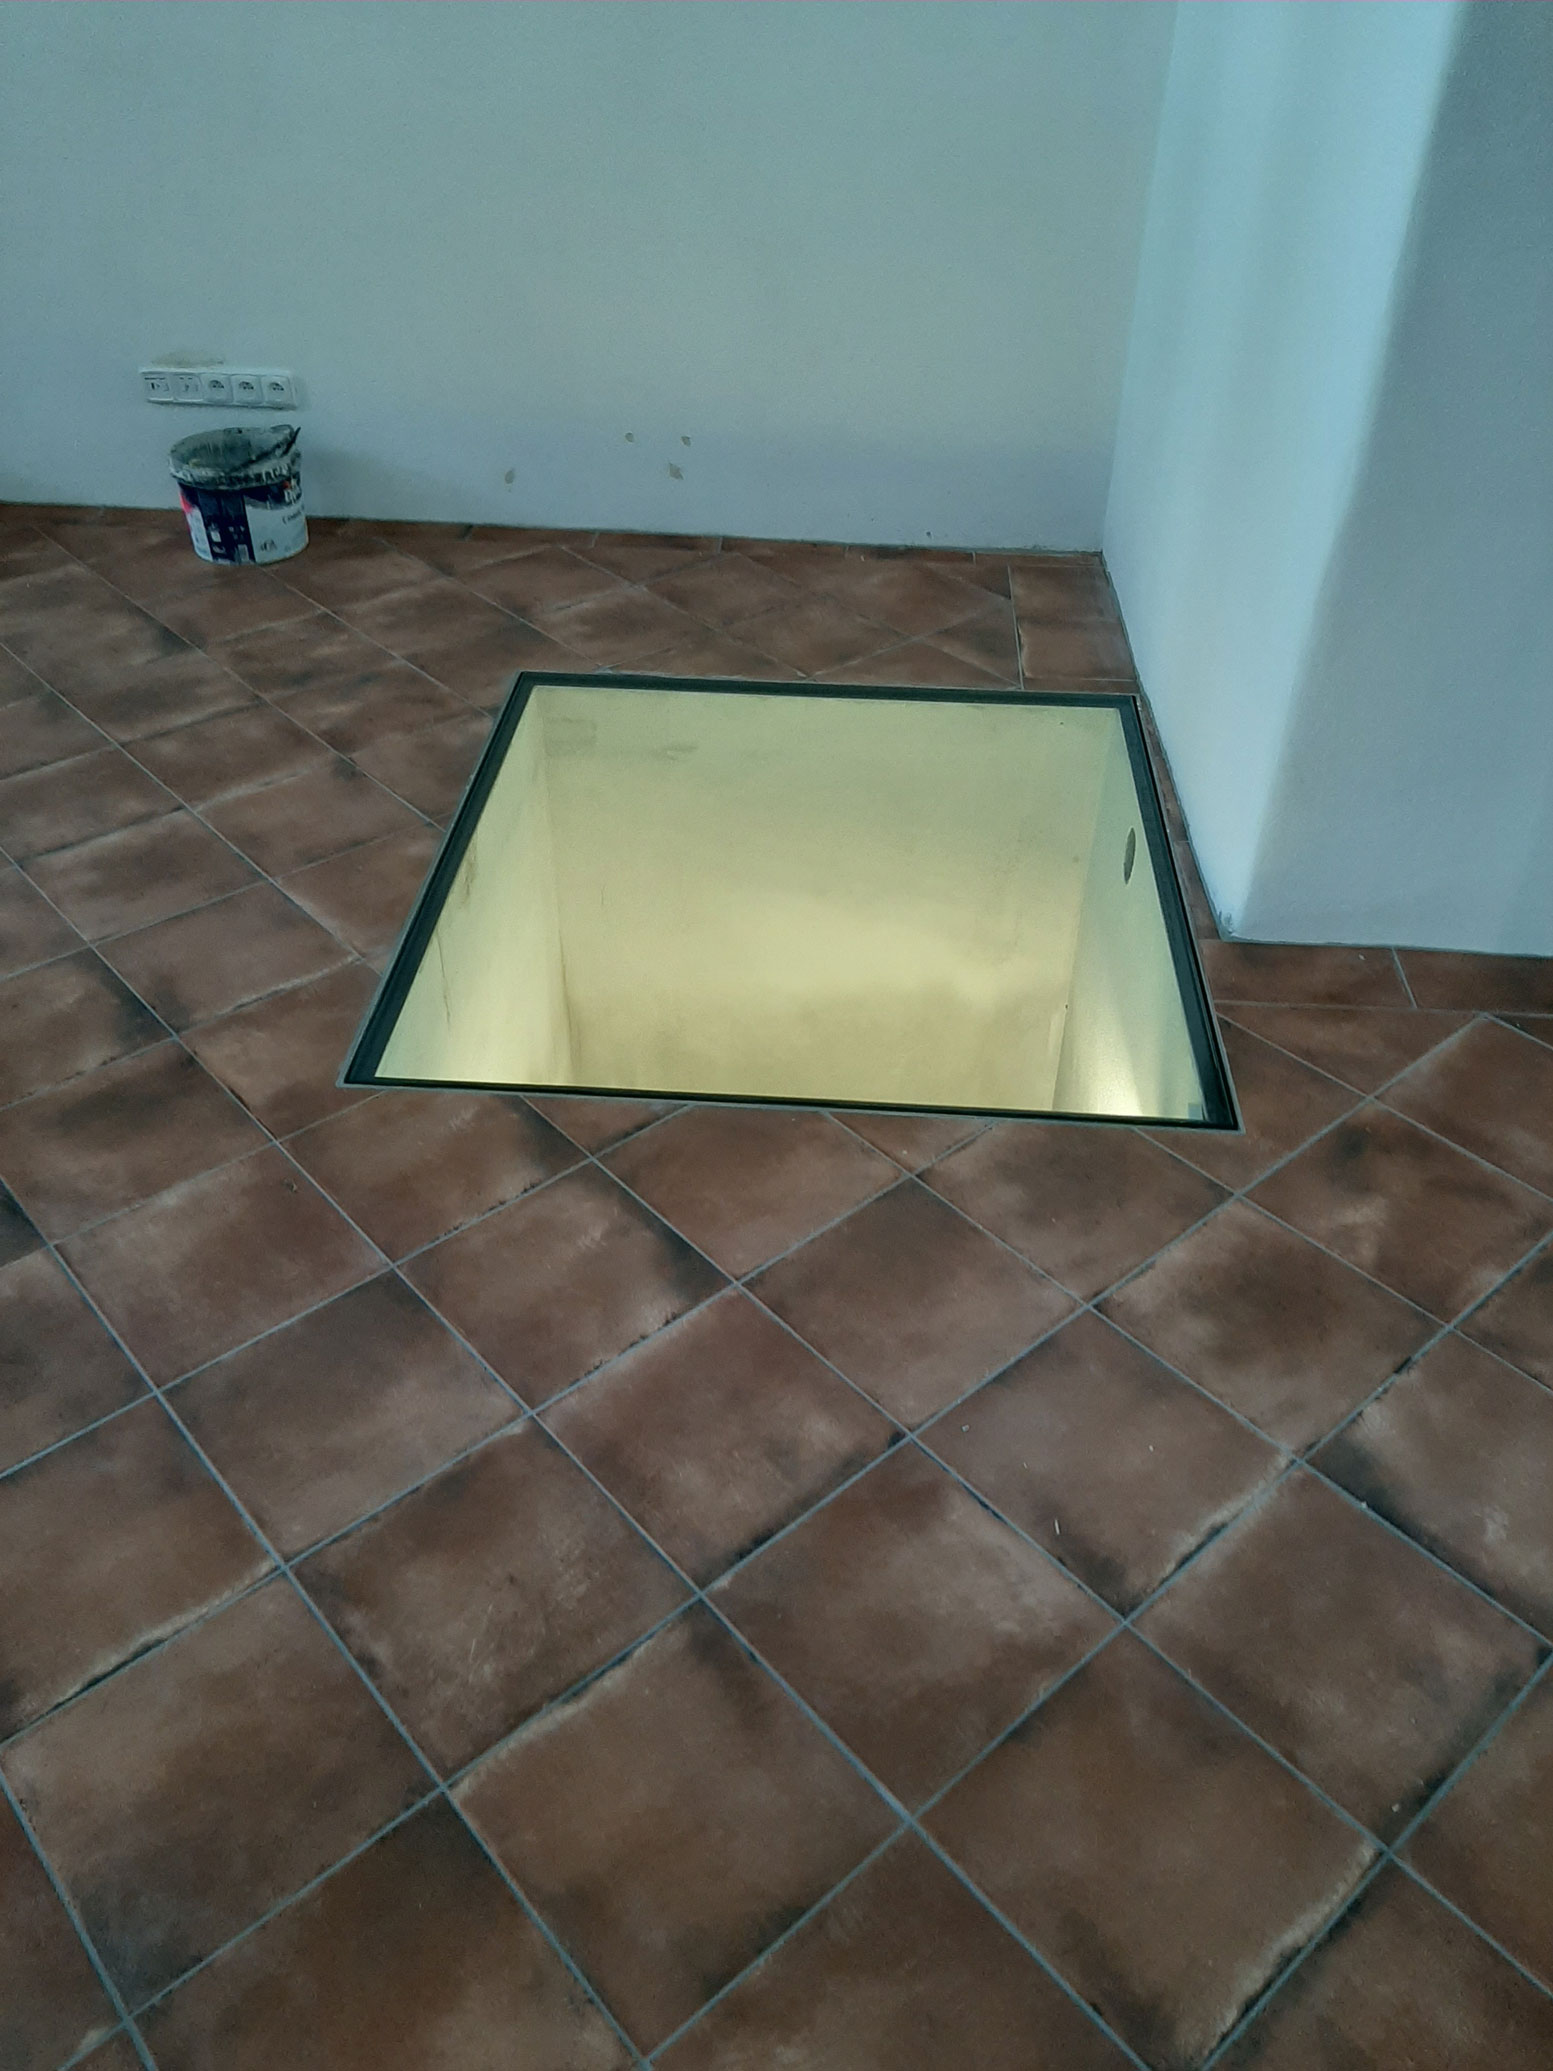 Sklenarstvi-Prerost-schody-a- pochozi-sklo (2)